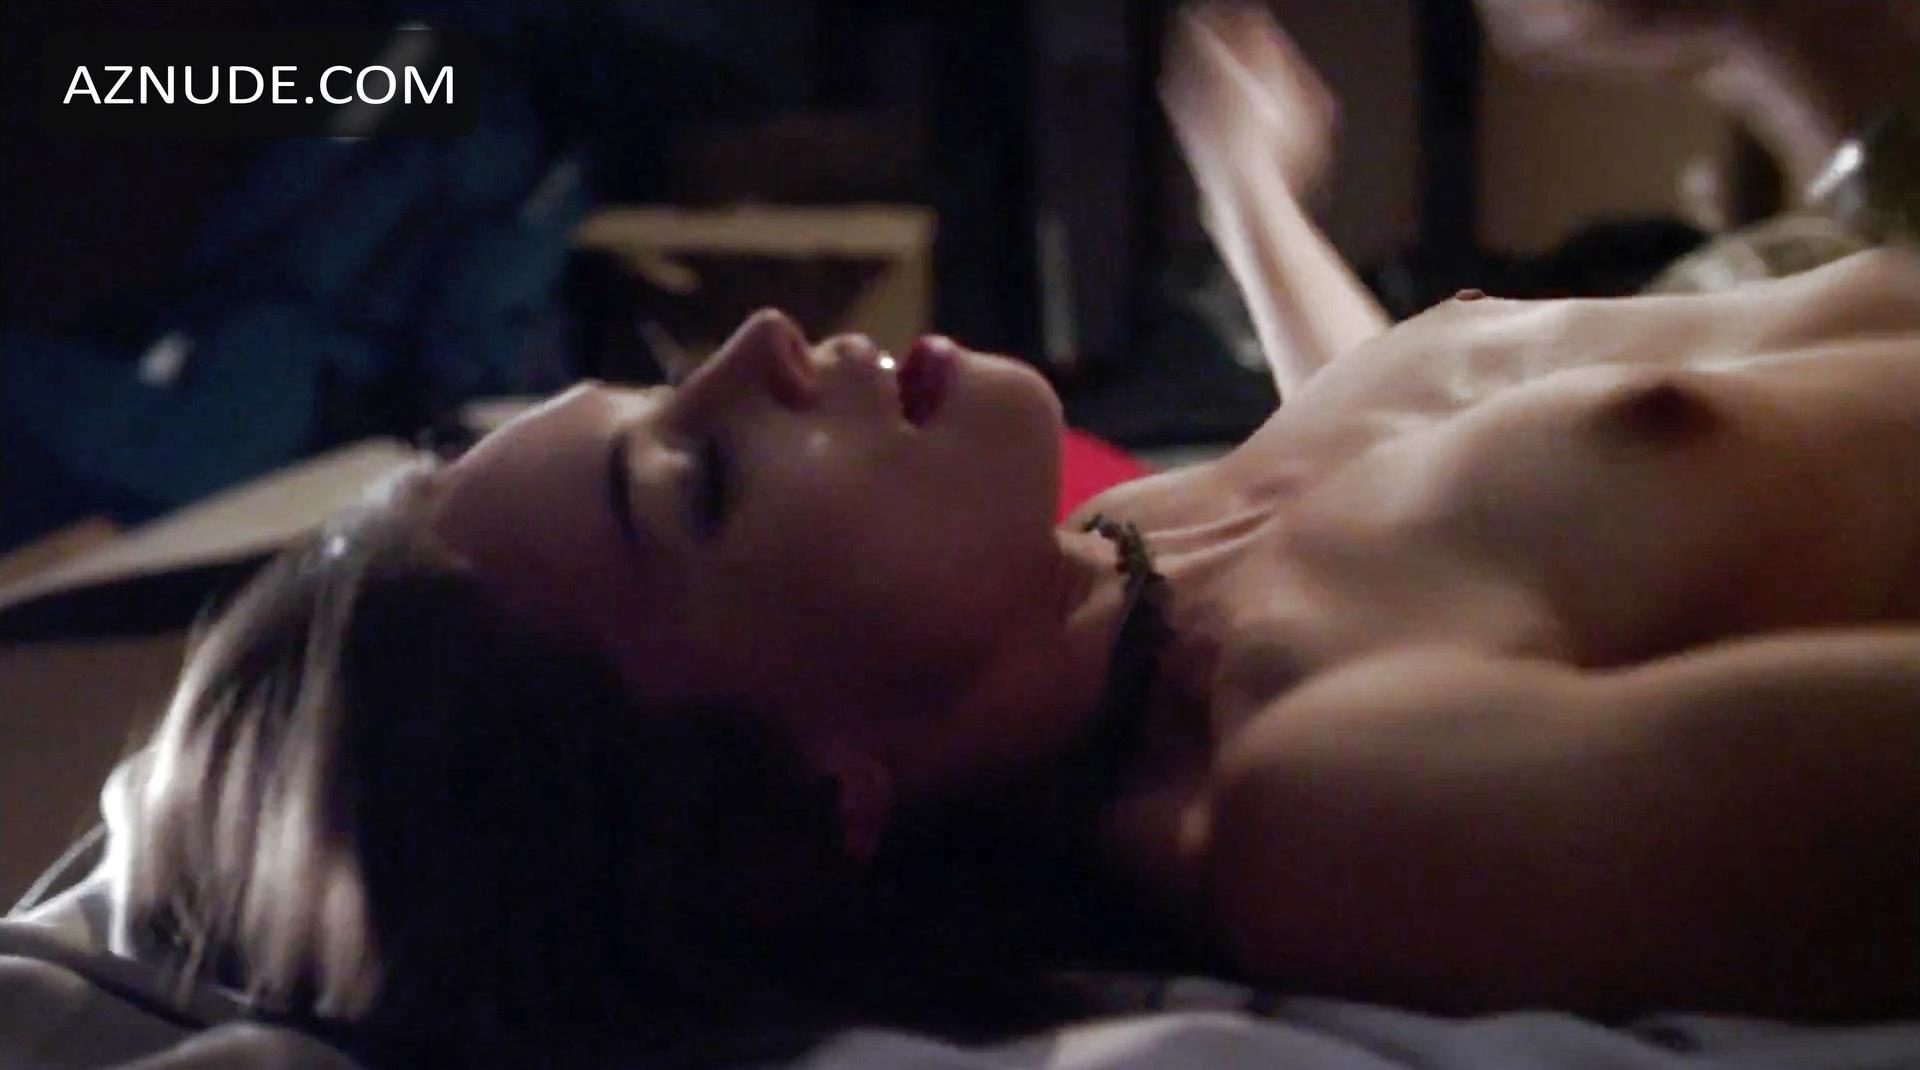 Drilling my girl from behind una buena cojida a mi mujer - 3 part 10